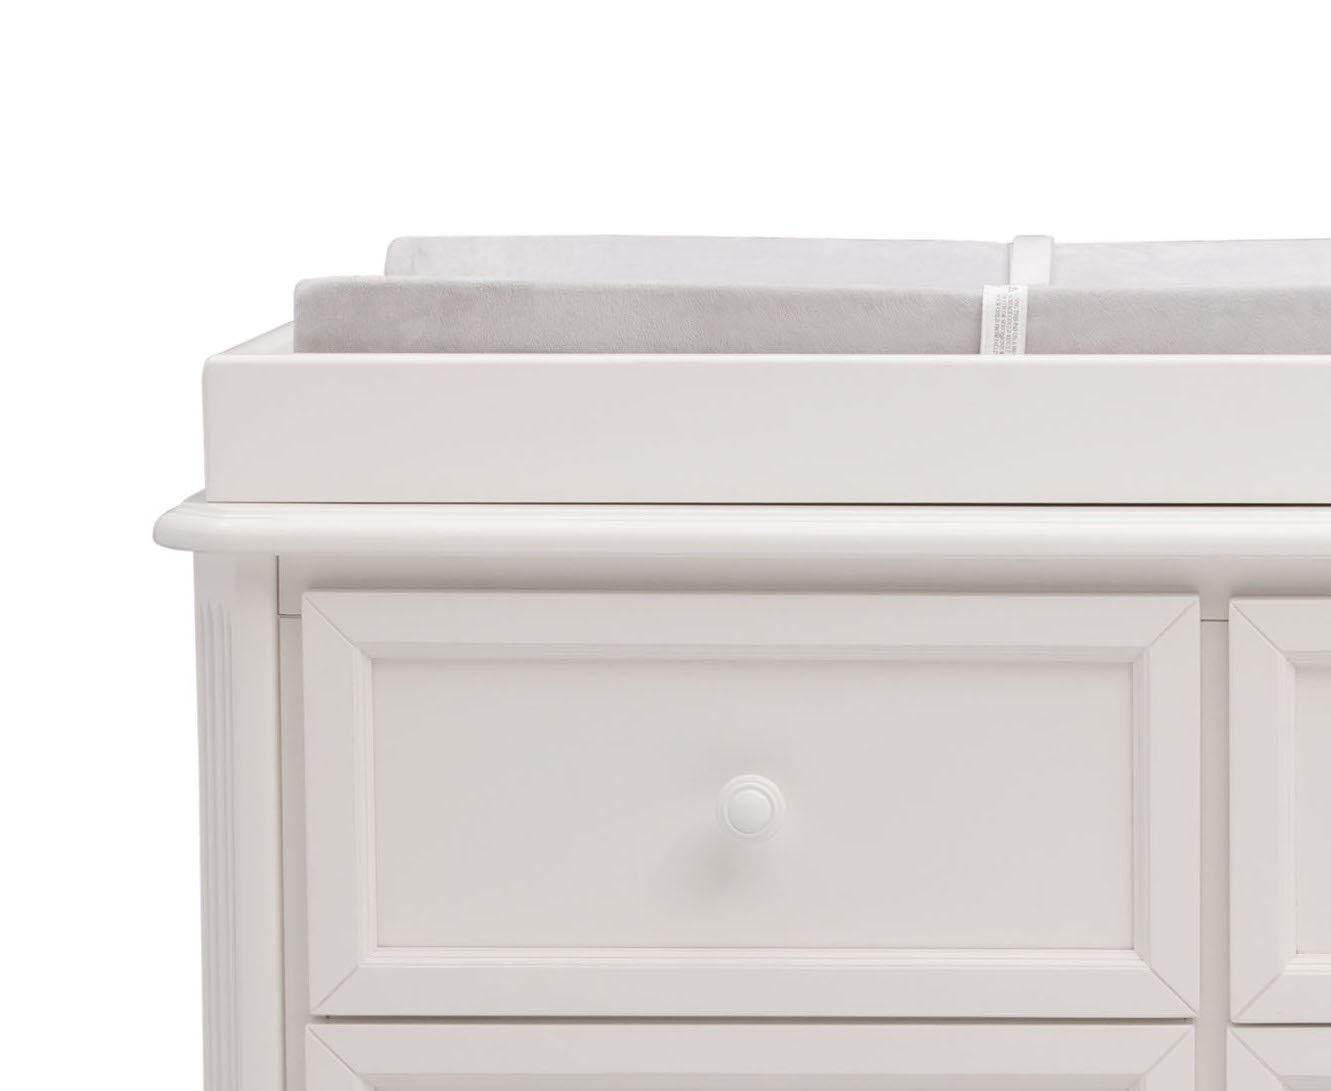 Simmons Kids Peyton 6-Piece Nursery Furniture Set (Convertible Crib, Dresser, Chest, Changing Top, Toddler Guardrail, Full Size Conversion), Bianca White by Delta Children (Image #9)